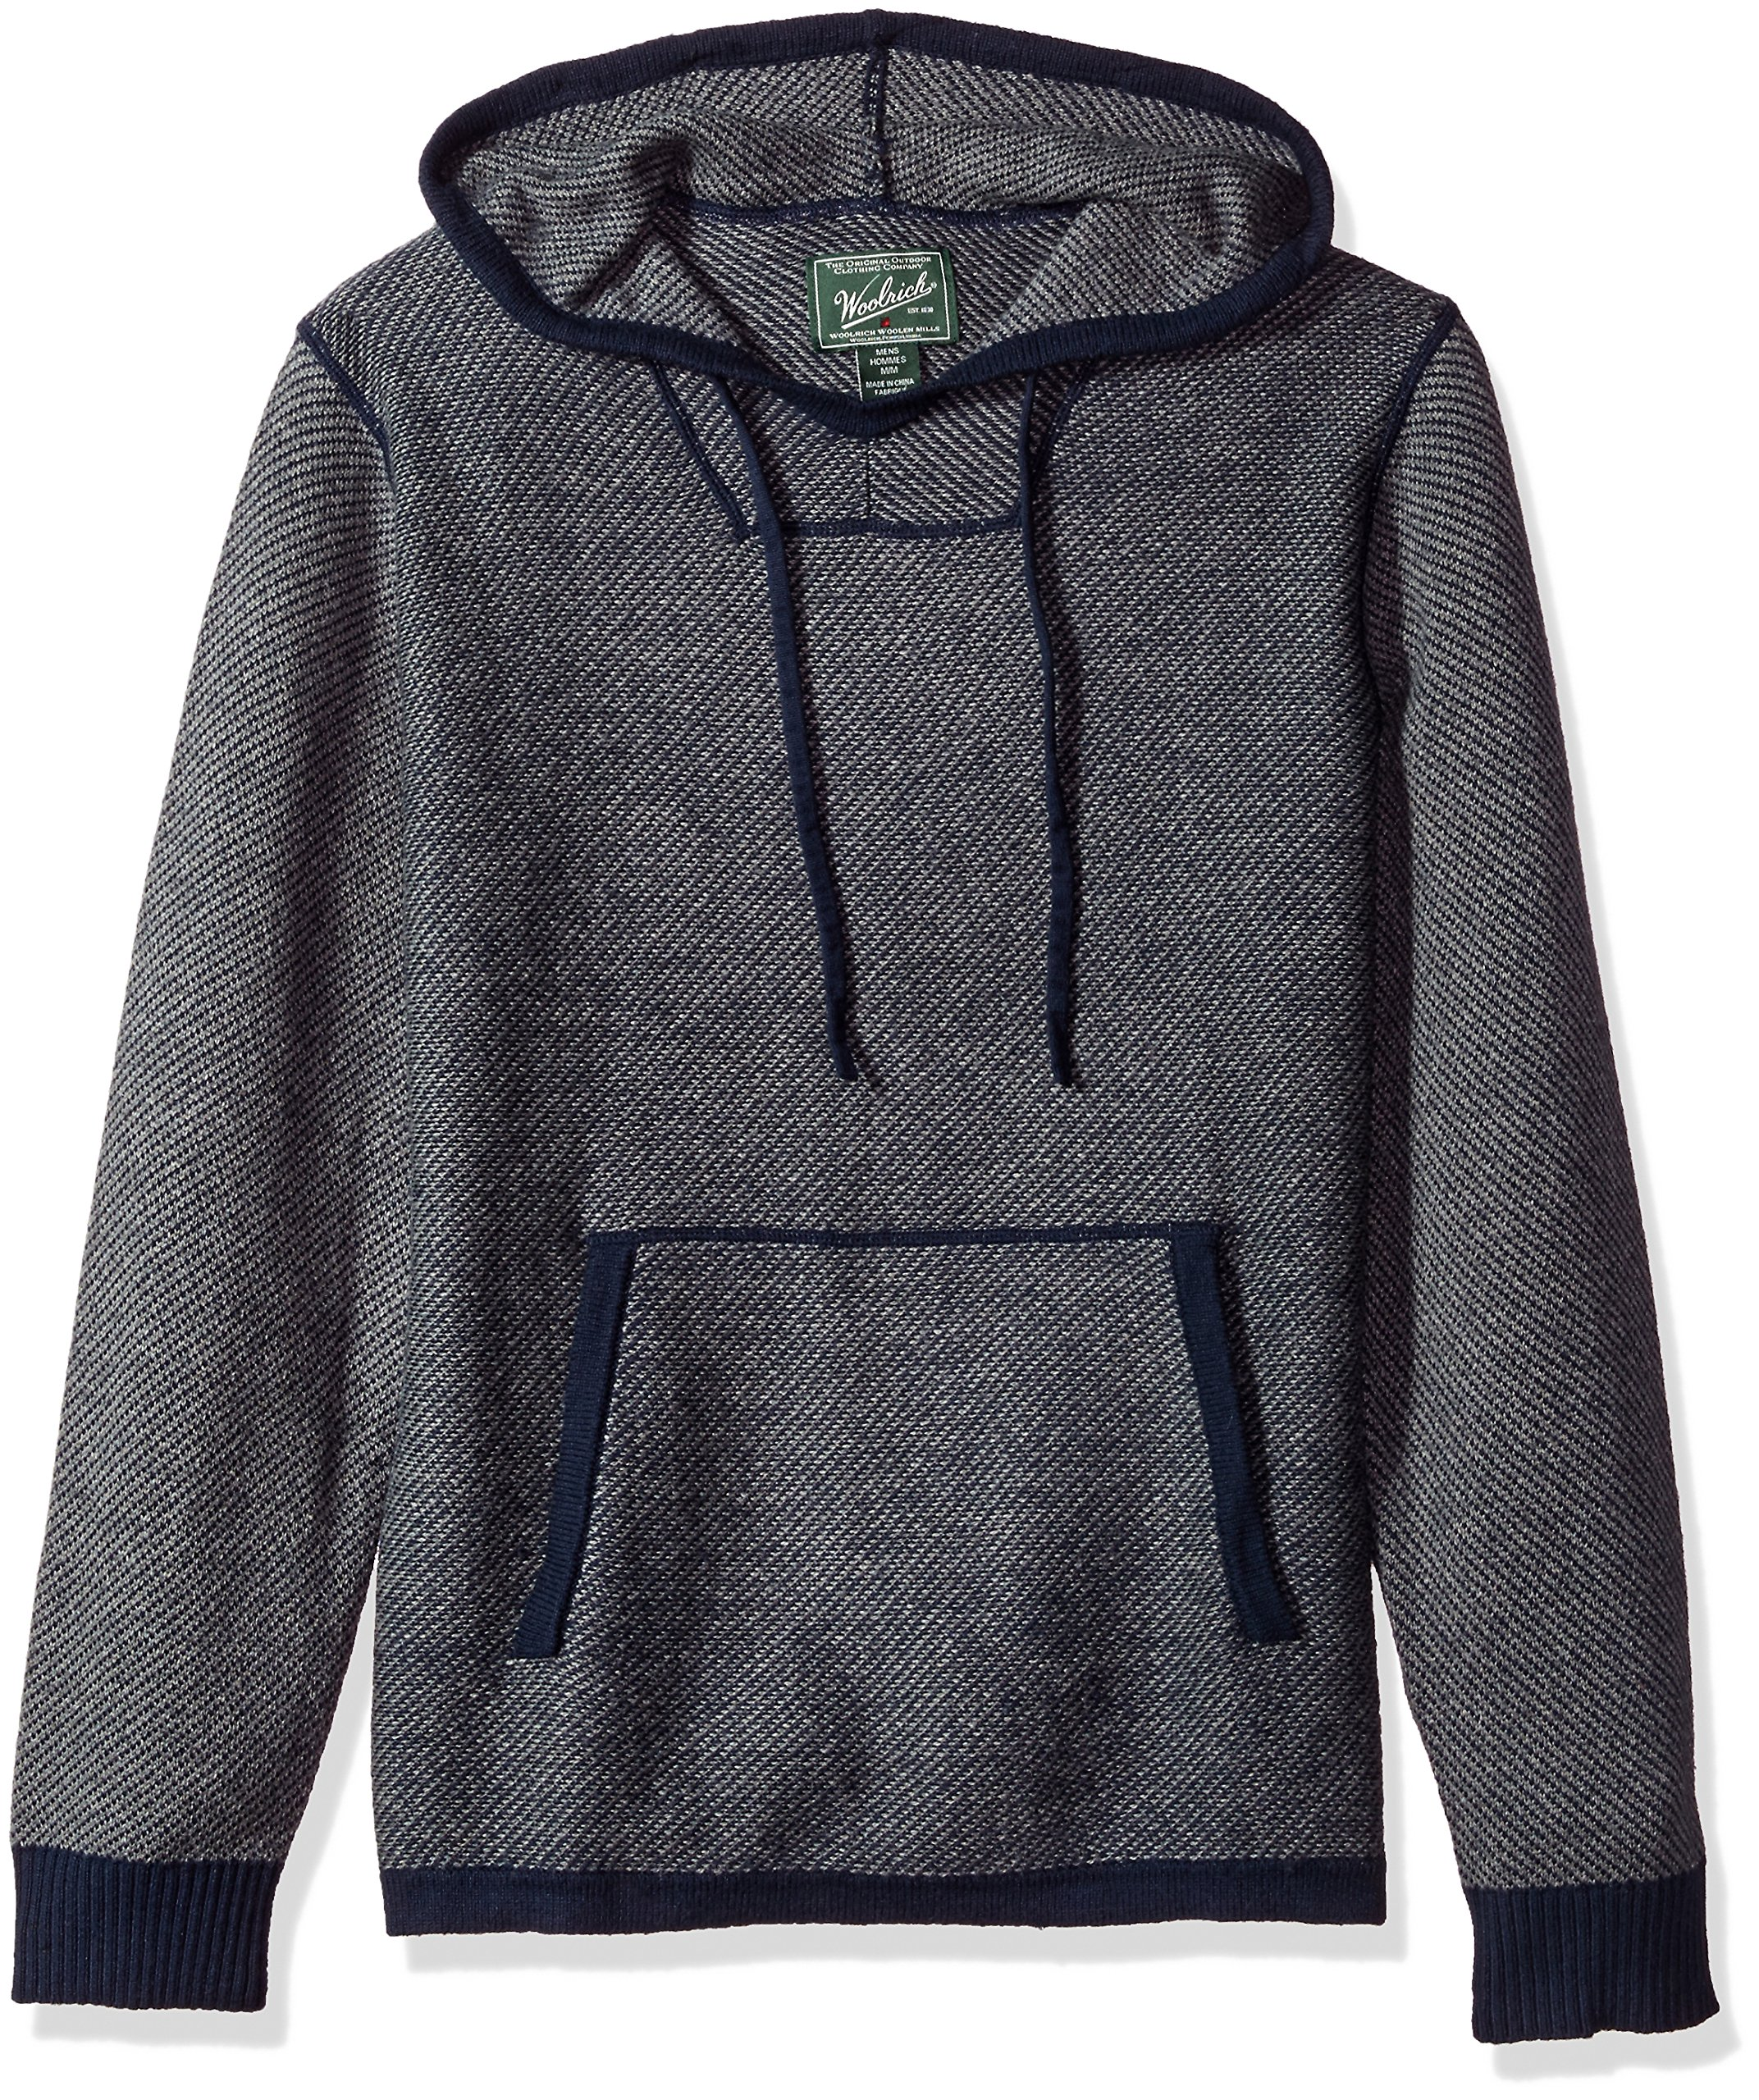 Woolrich Men's Twill Baja Hooded Merino Sweater, Deep Indigo, Extra Large